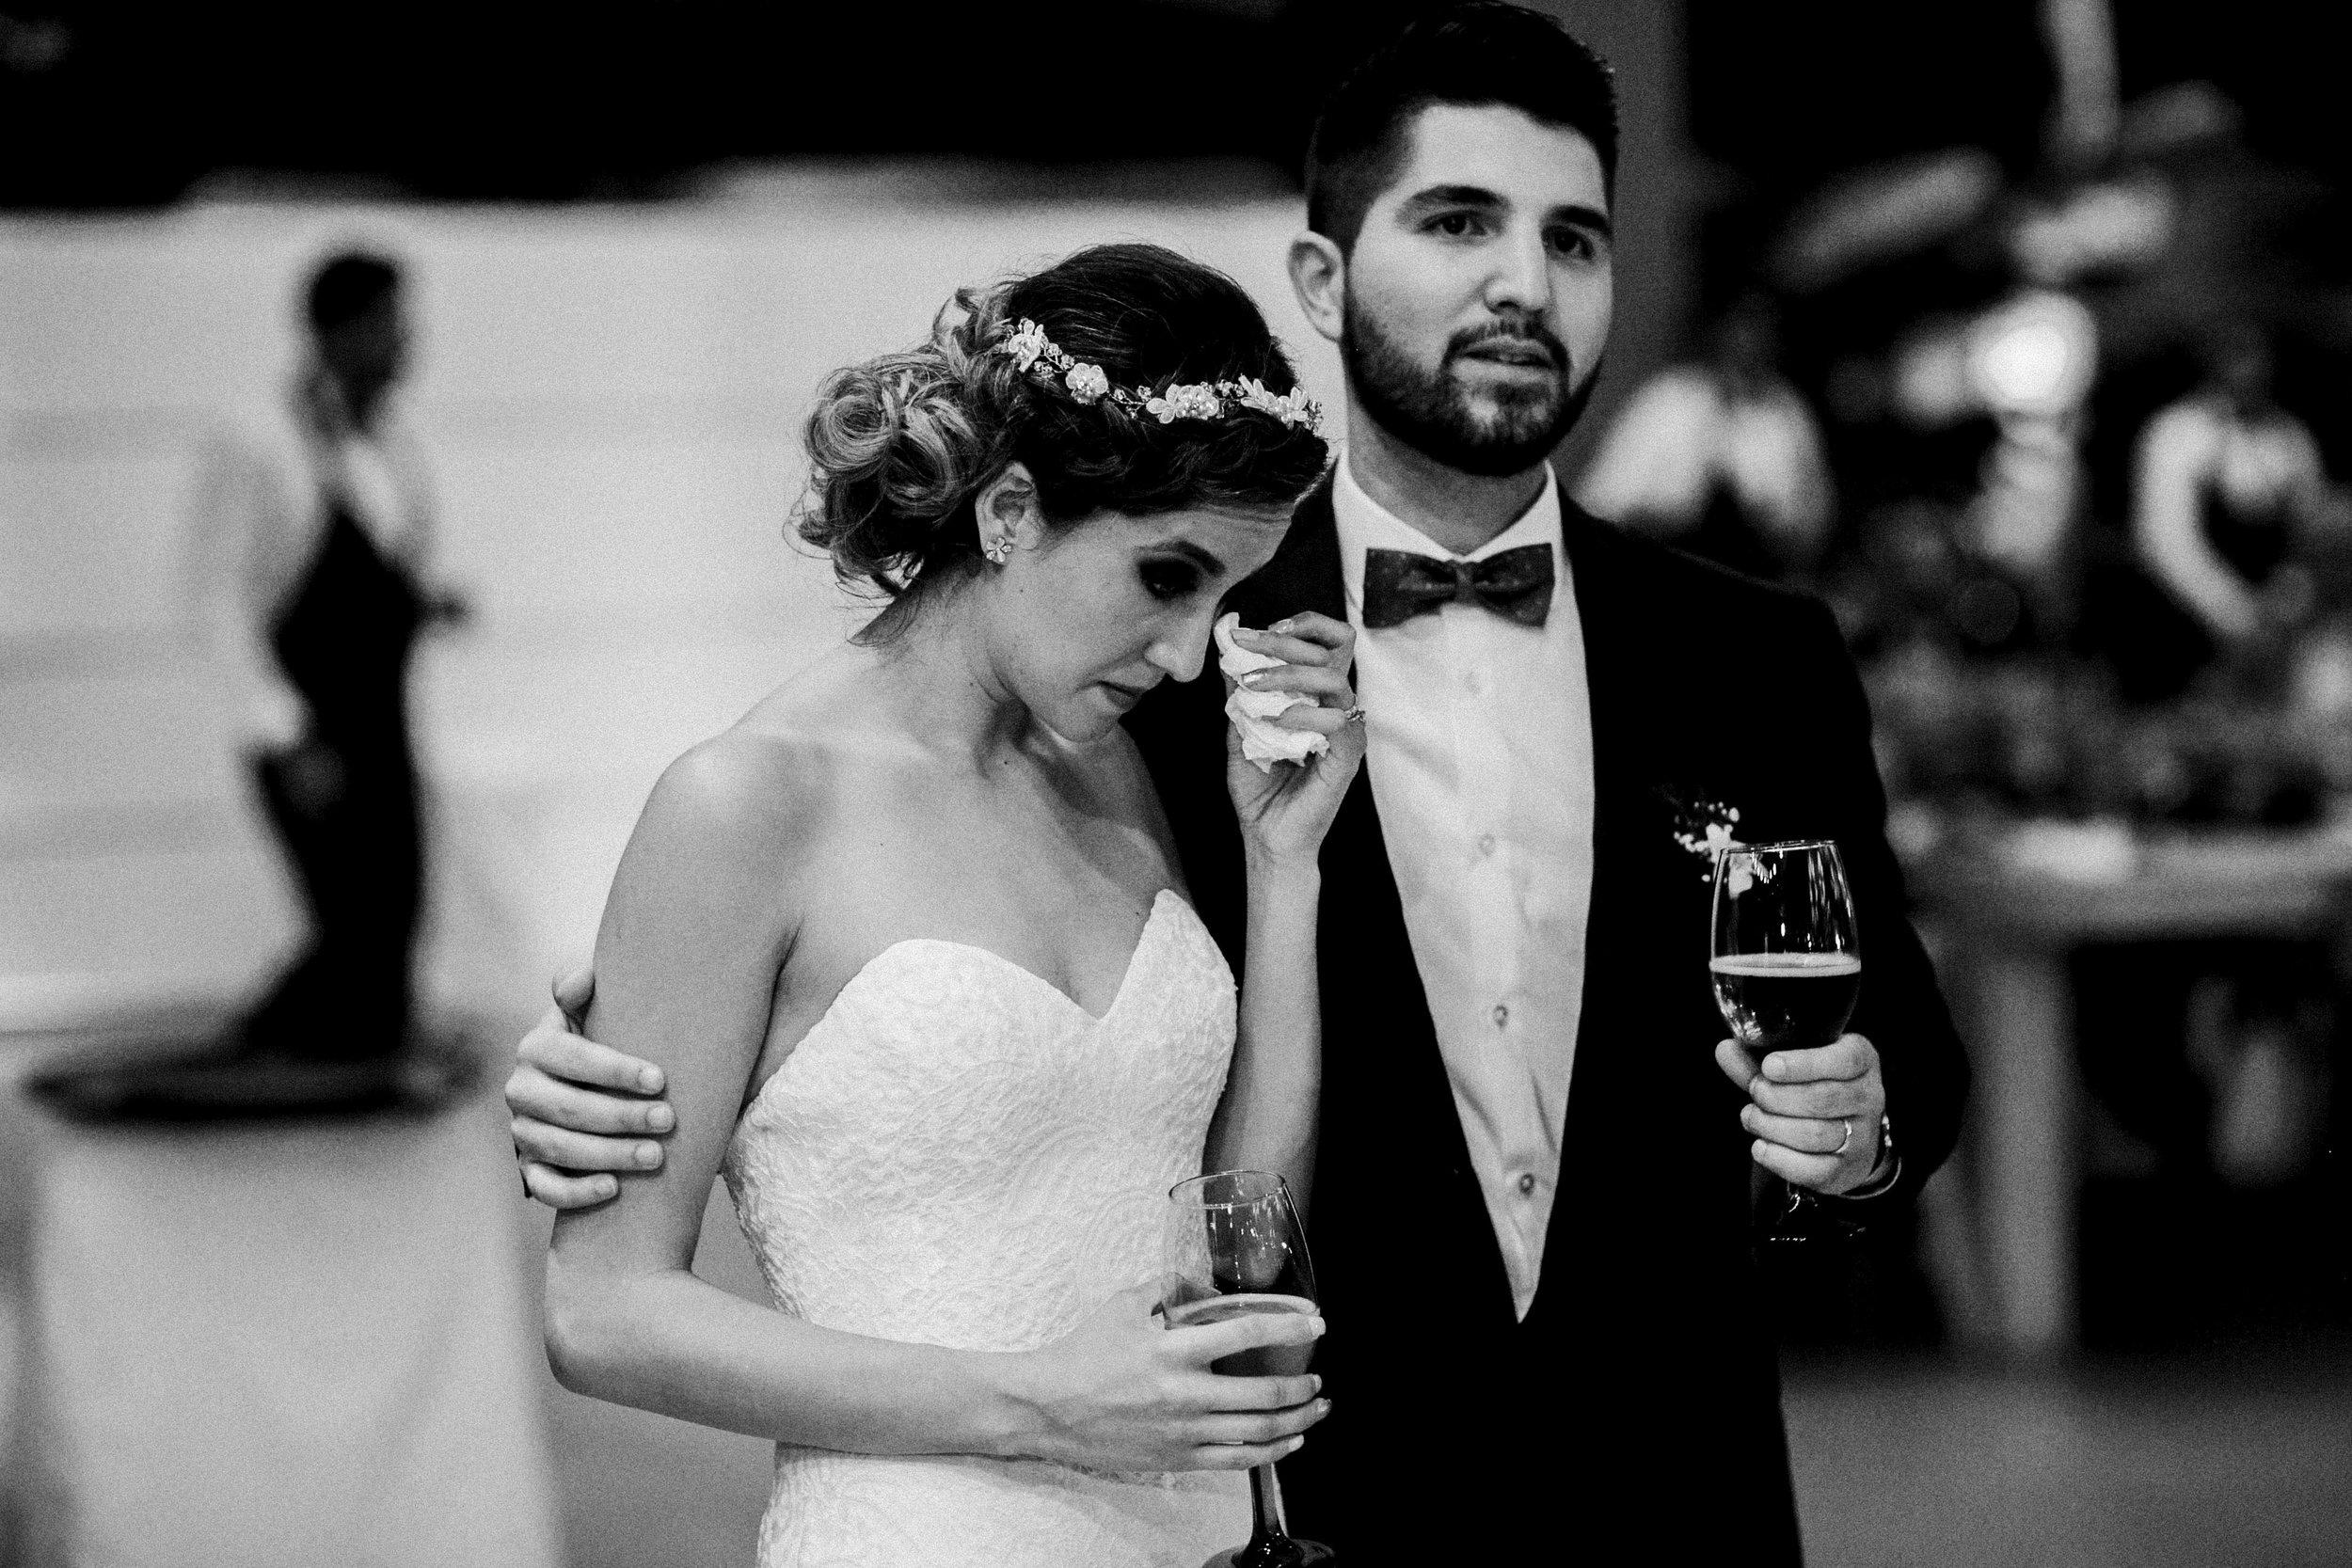 alfonso_flores_destination_wedding_photography_jardin_amarello_cuernavaca113.jpg